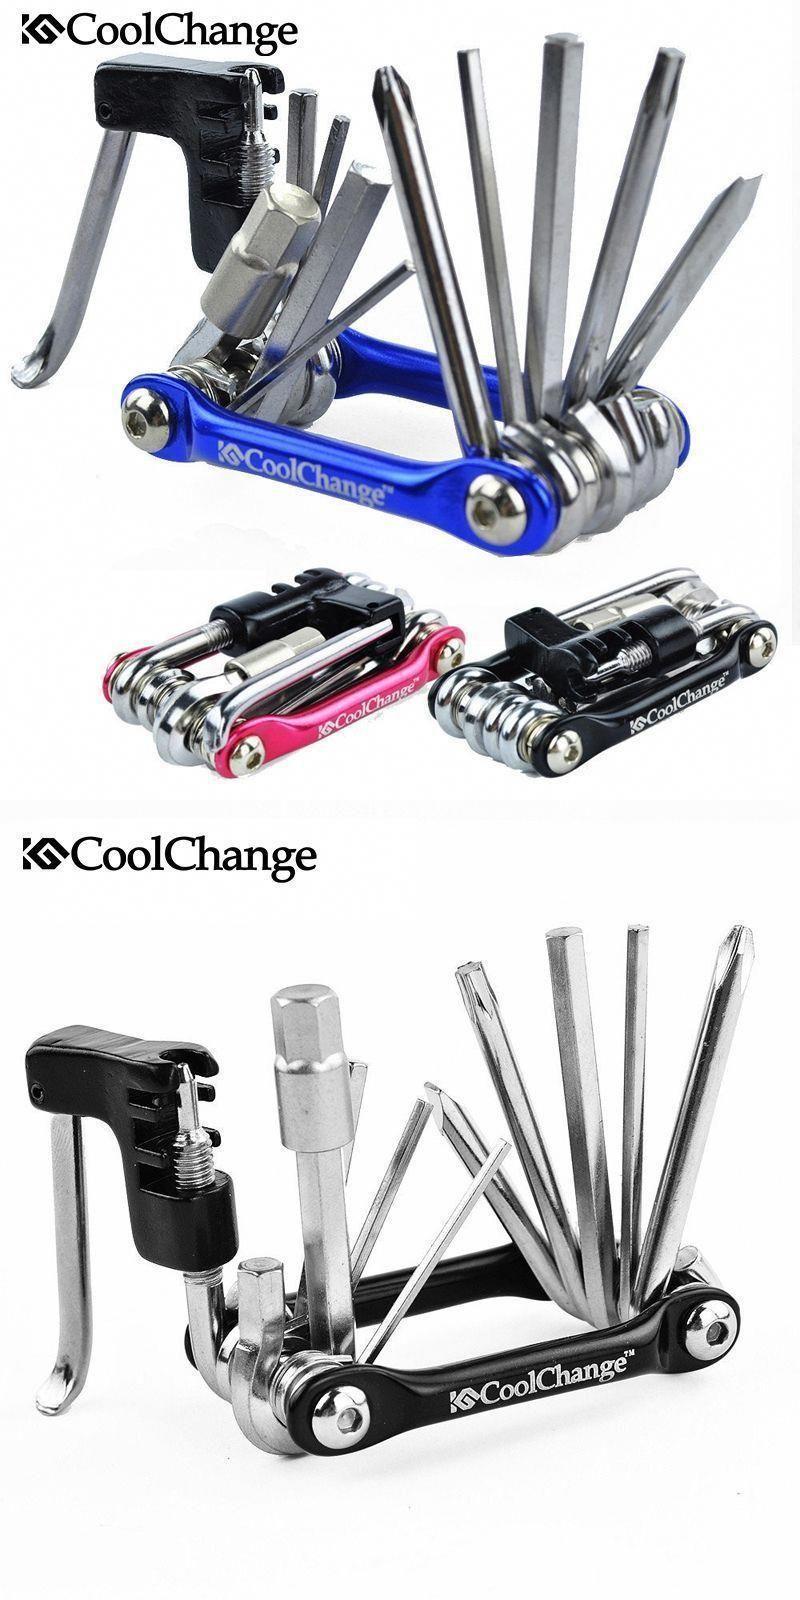 Coolchange bicycle repair tools multifunction tools kit